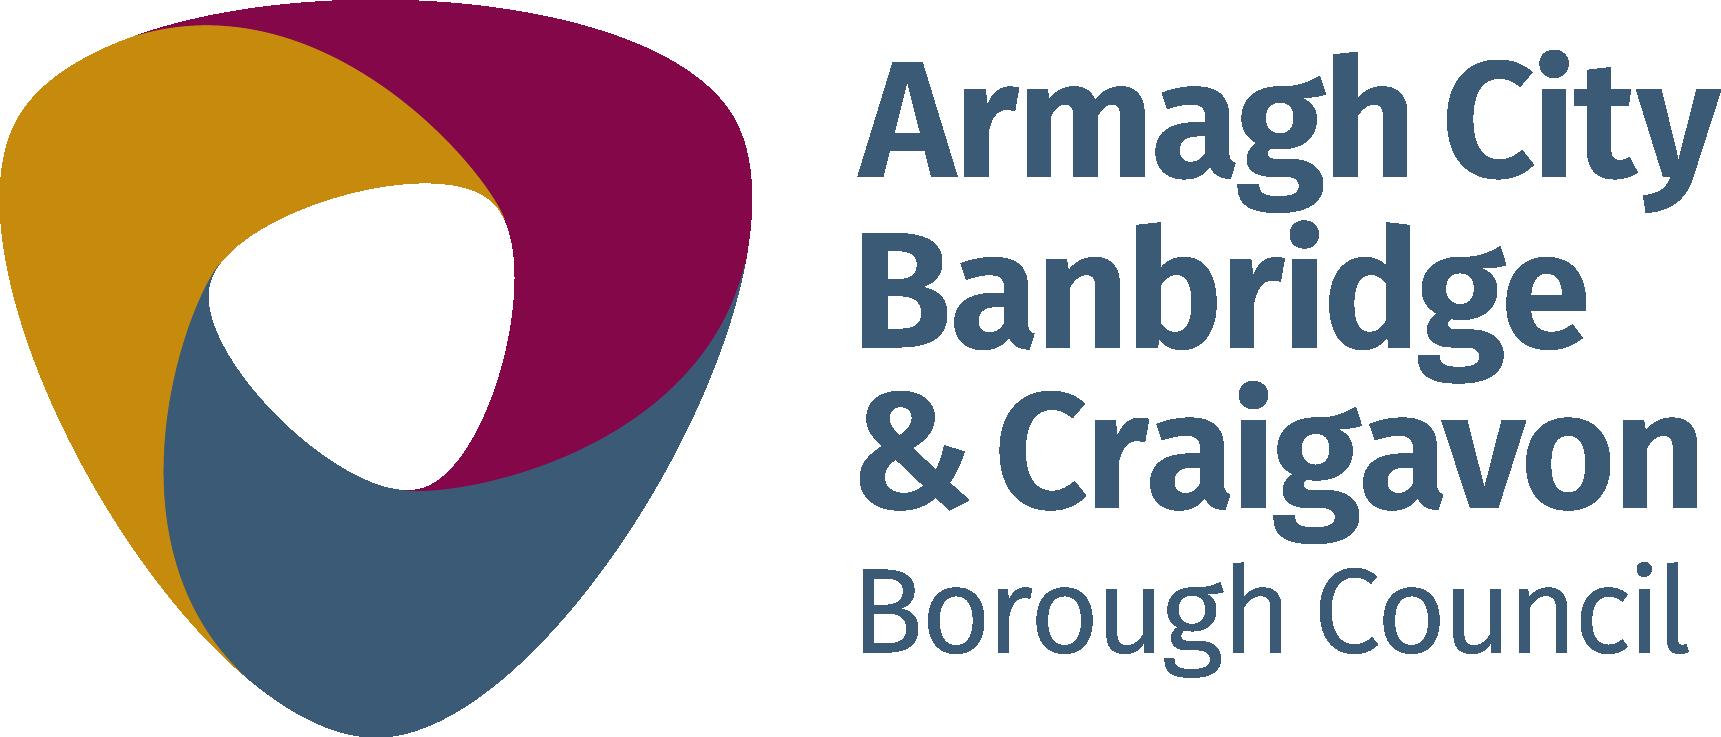 Armagh City Banbridge & Craigavon